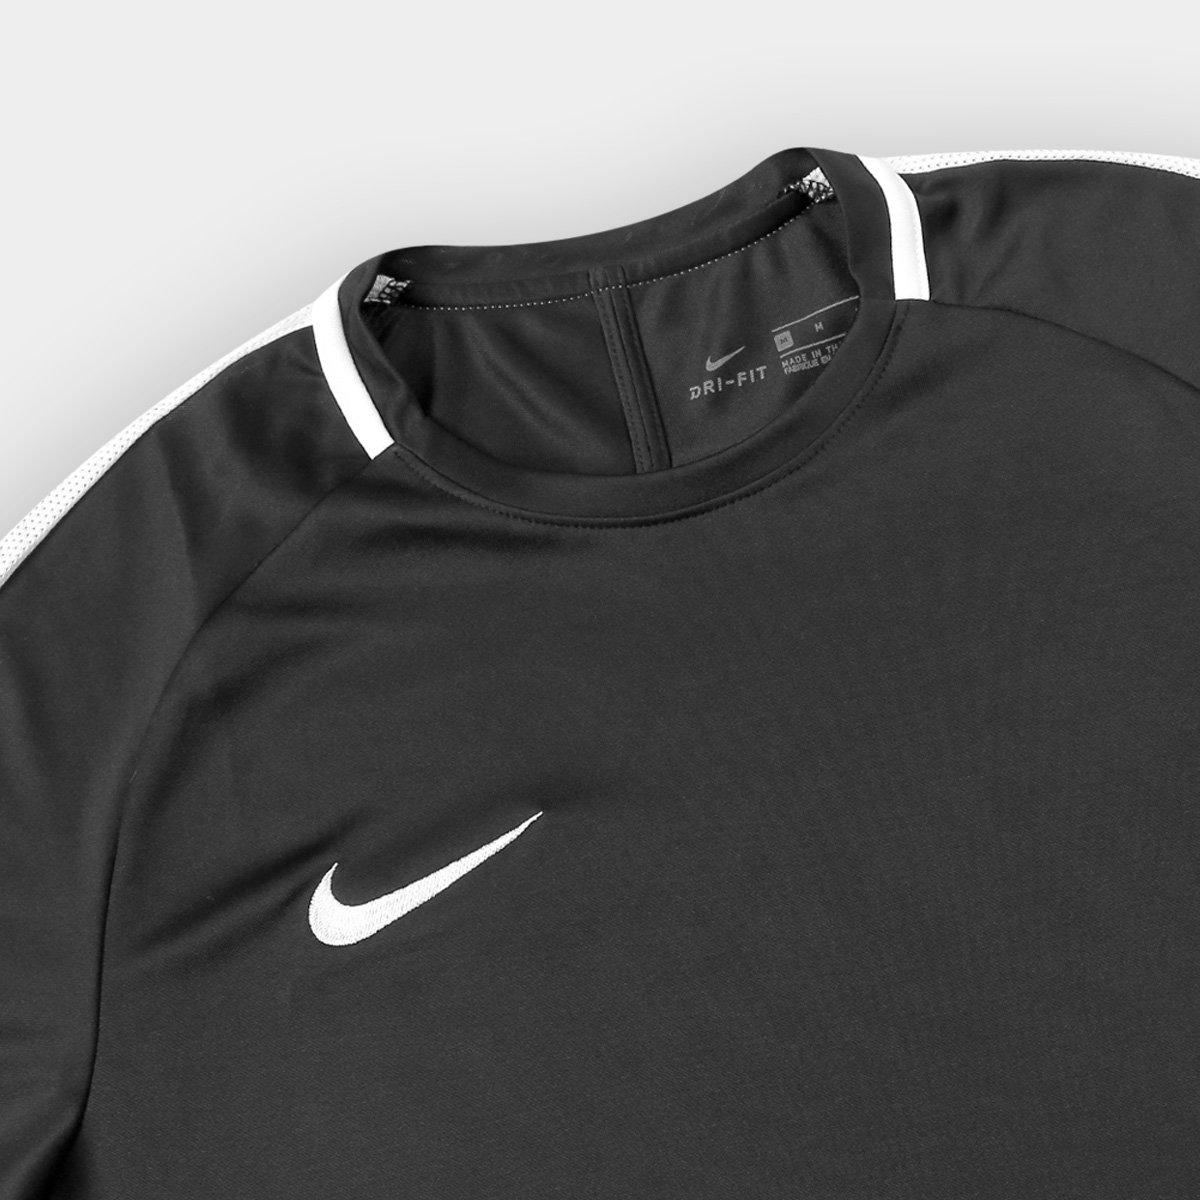 7781ce517b 69d8f2885a9b58  Camisa Nike Academy Masculina - Preto e Branco - Compre  Agora Netshoes 8934d03515a92e ...